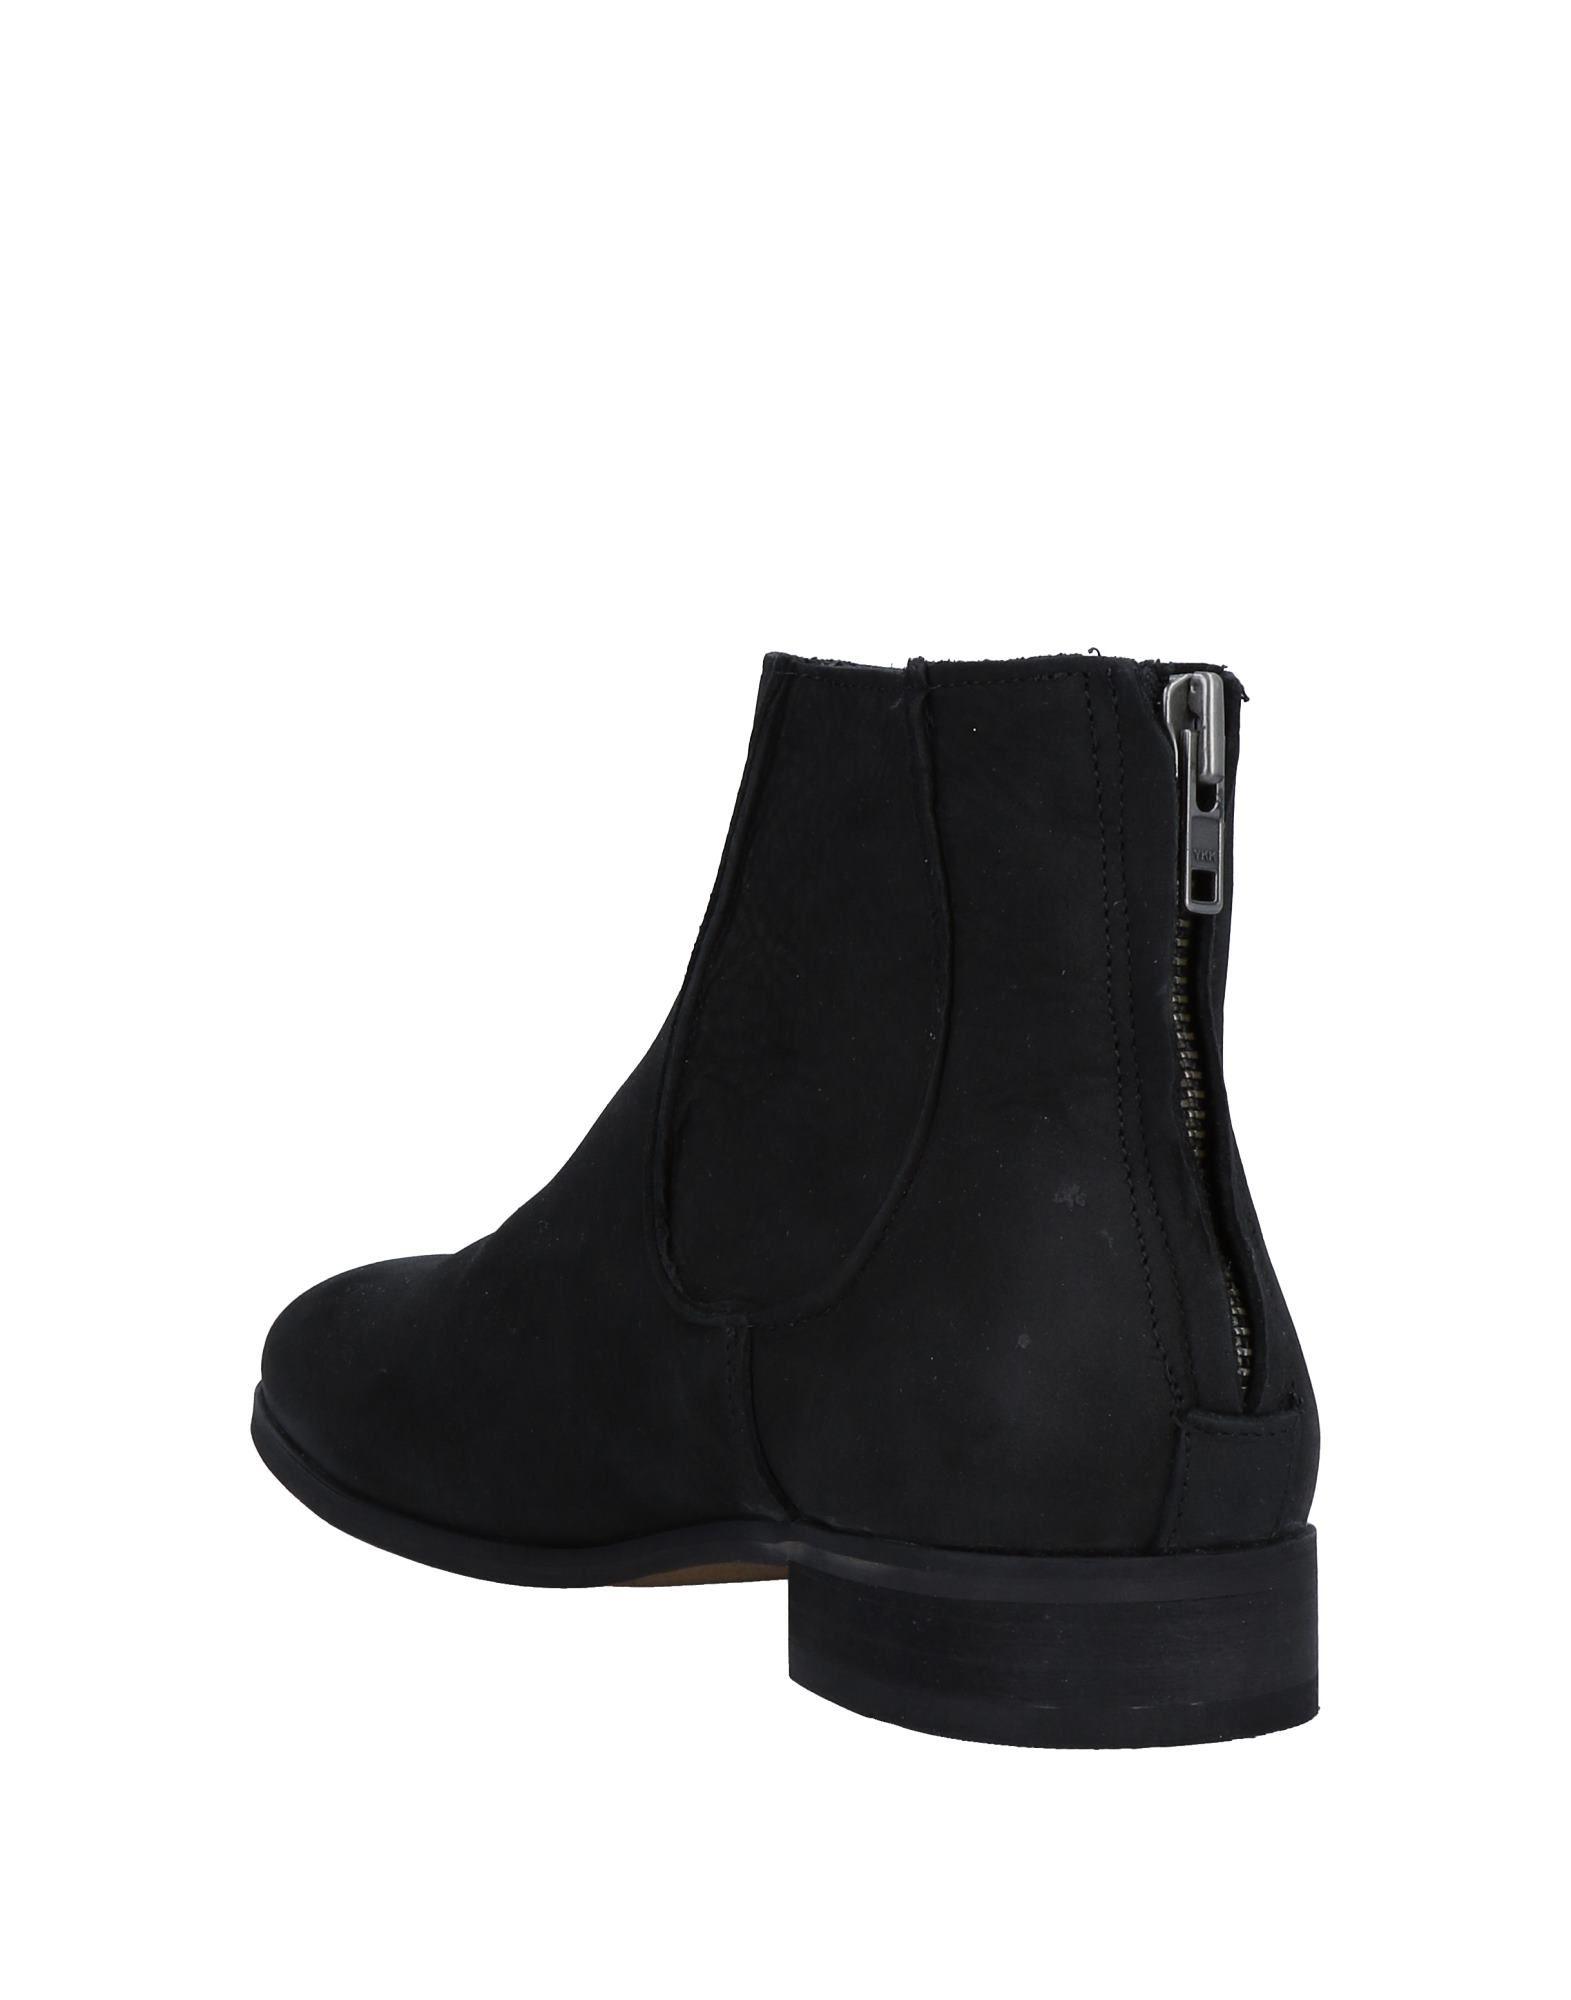 Shoe Shoe Shoe The Bear Boots - Men Shoe The Bear Boots online on  Australia - 11580638TJ 20219f